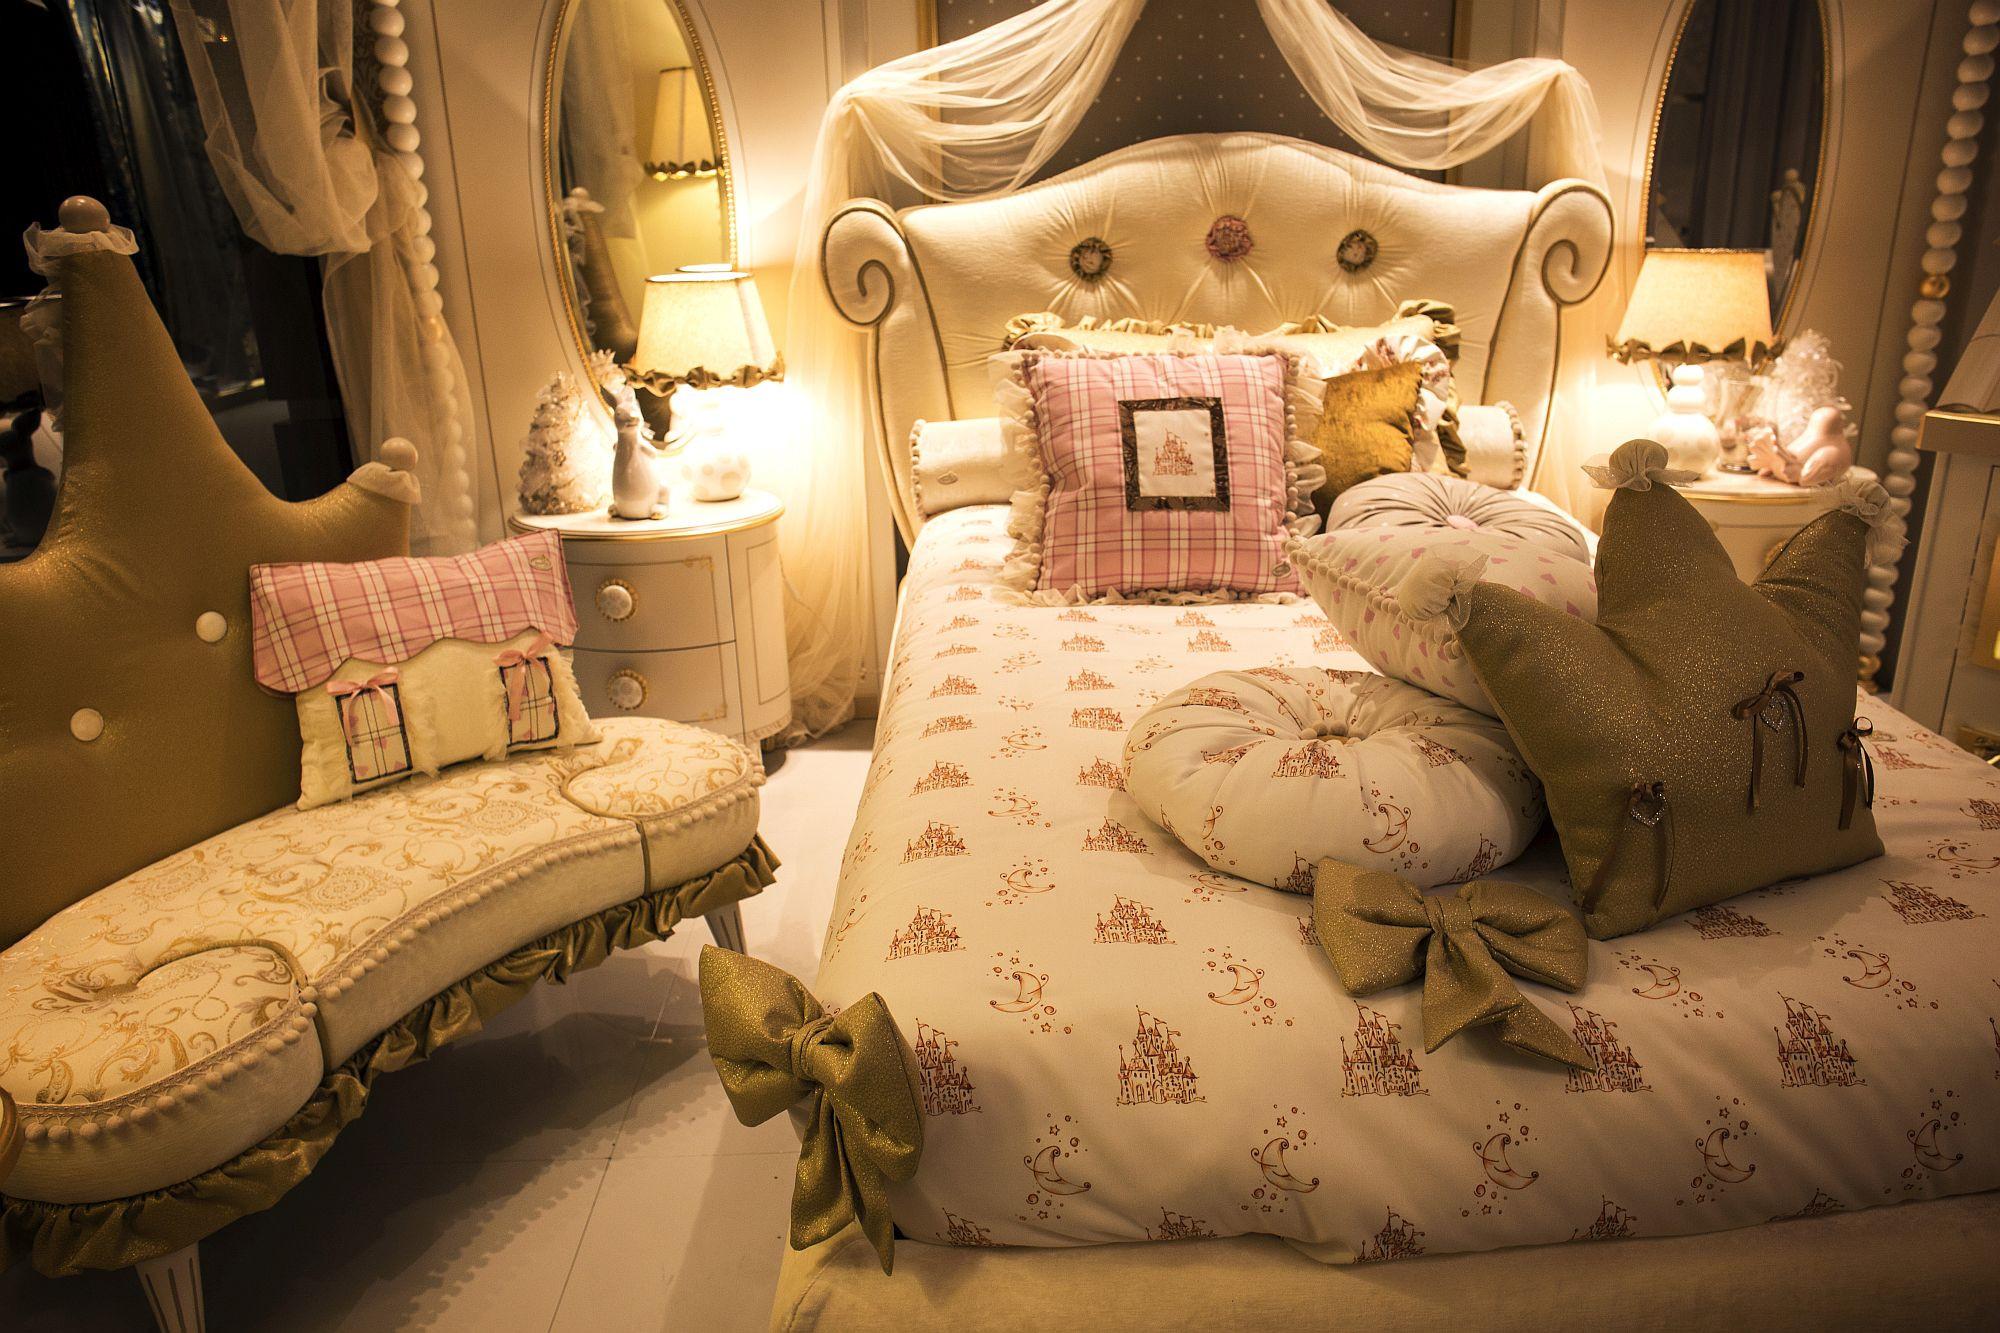 Kids Princess Room  50 Latest Kids' Bedroom Decorating and Furniture Ideas